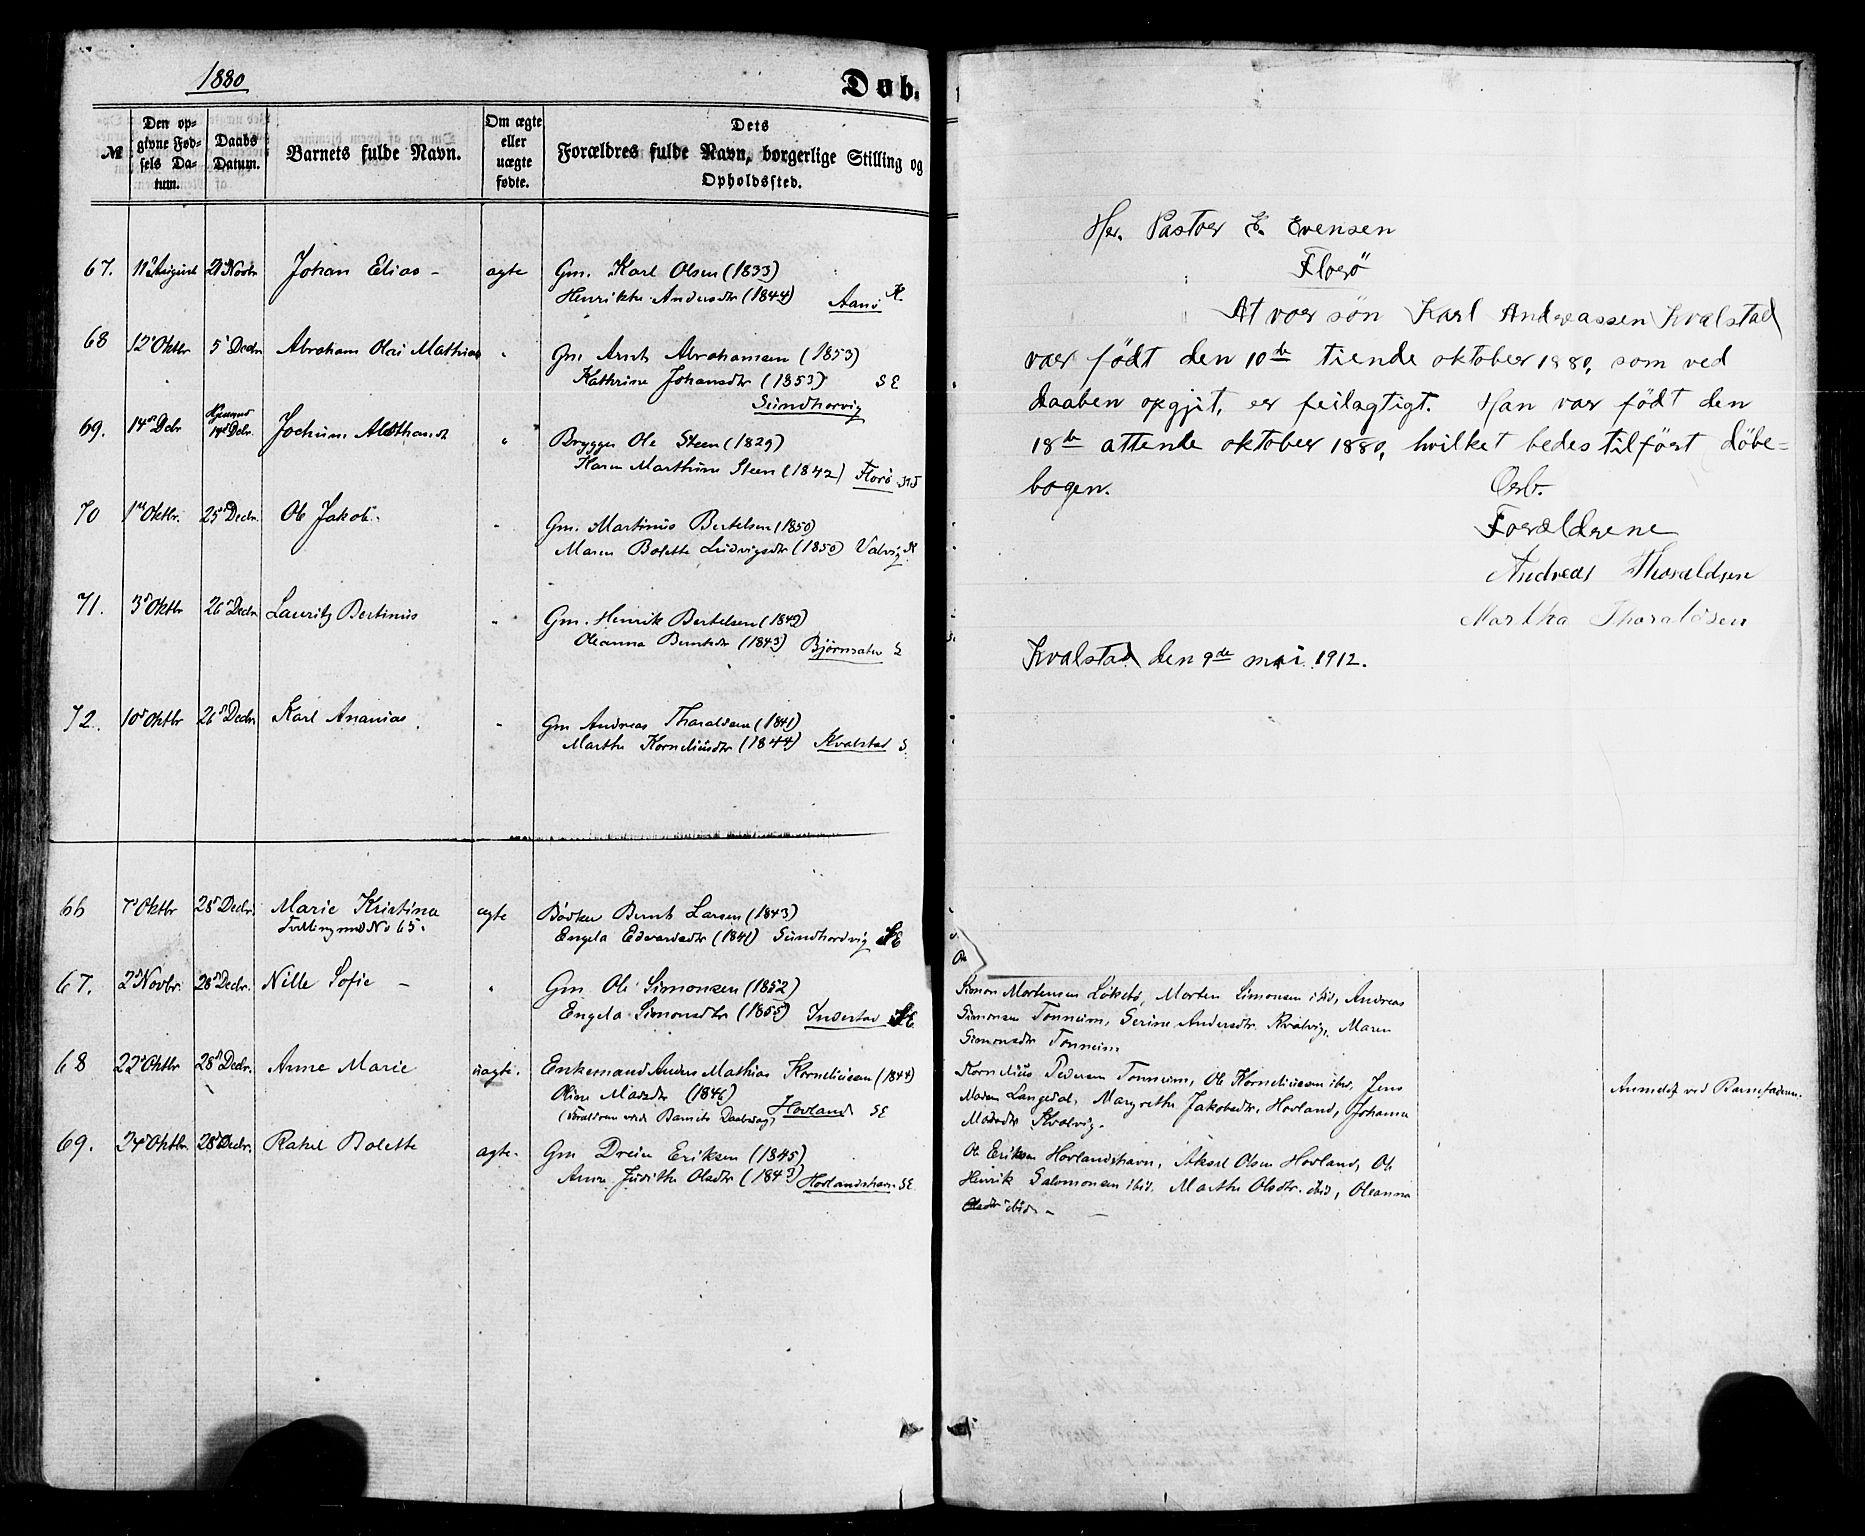 SAB, Kinn sokneprestembete, H/Haa/Haaa/L0006: Ministerialbok nr. A 6, 1857-1885, s. 251